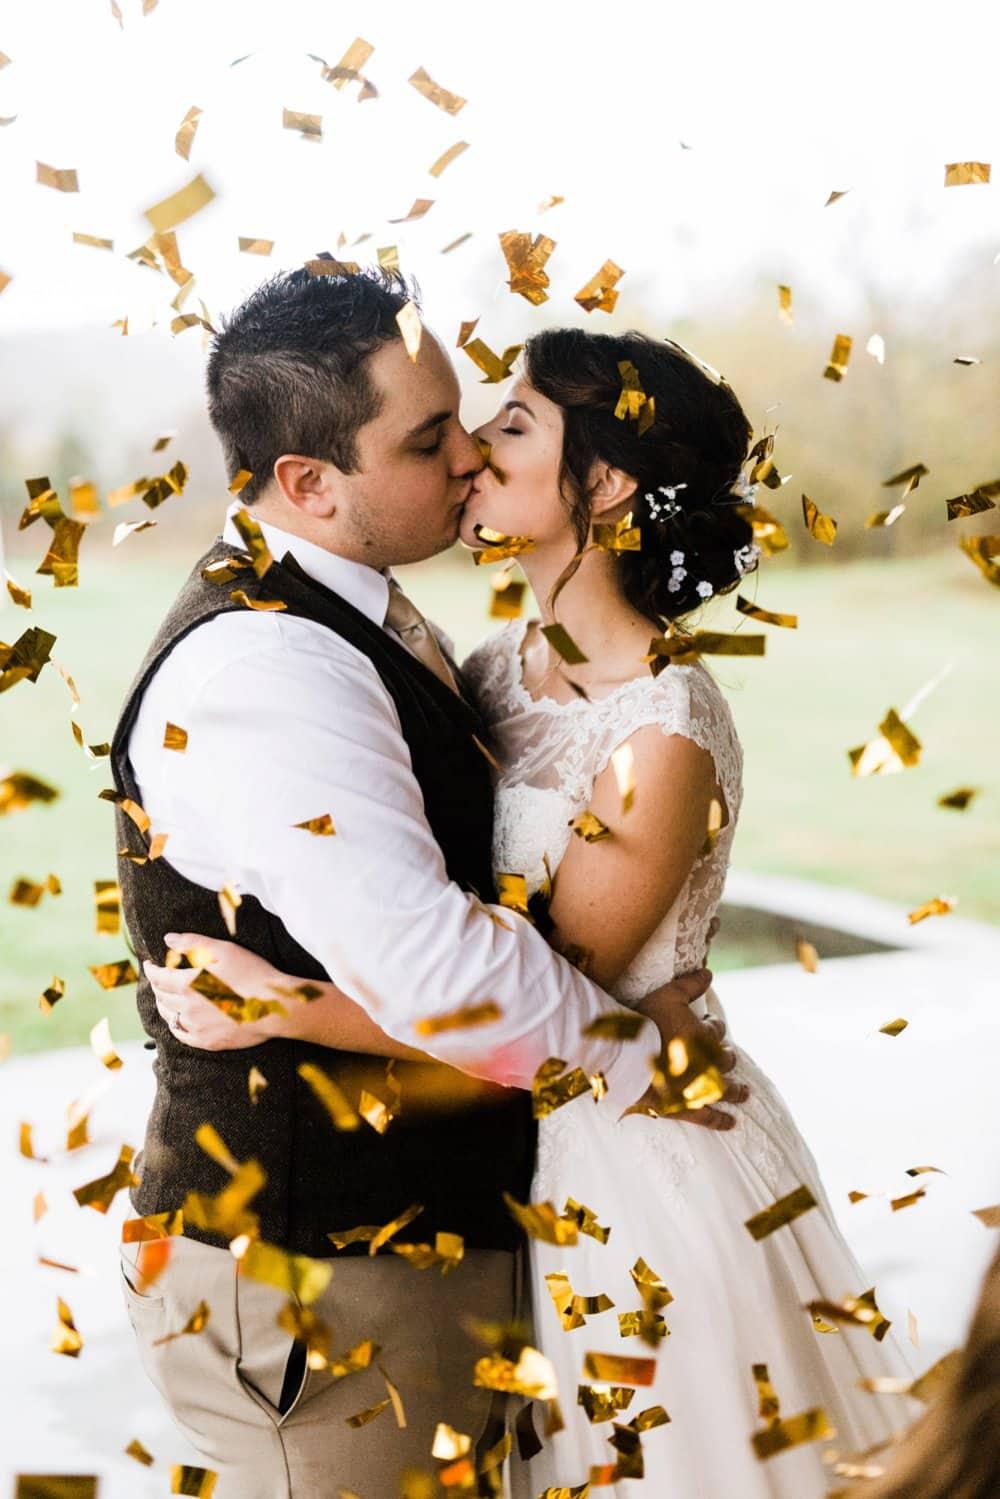 bride and groom photo, fall wedding, confetti photo